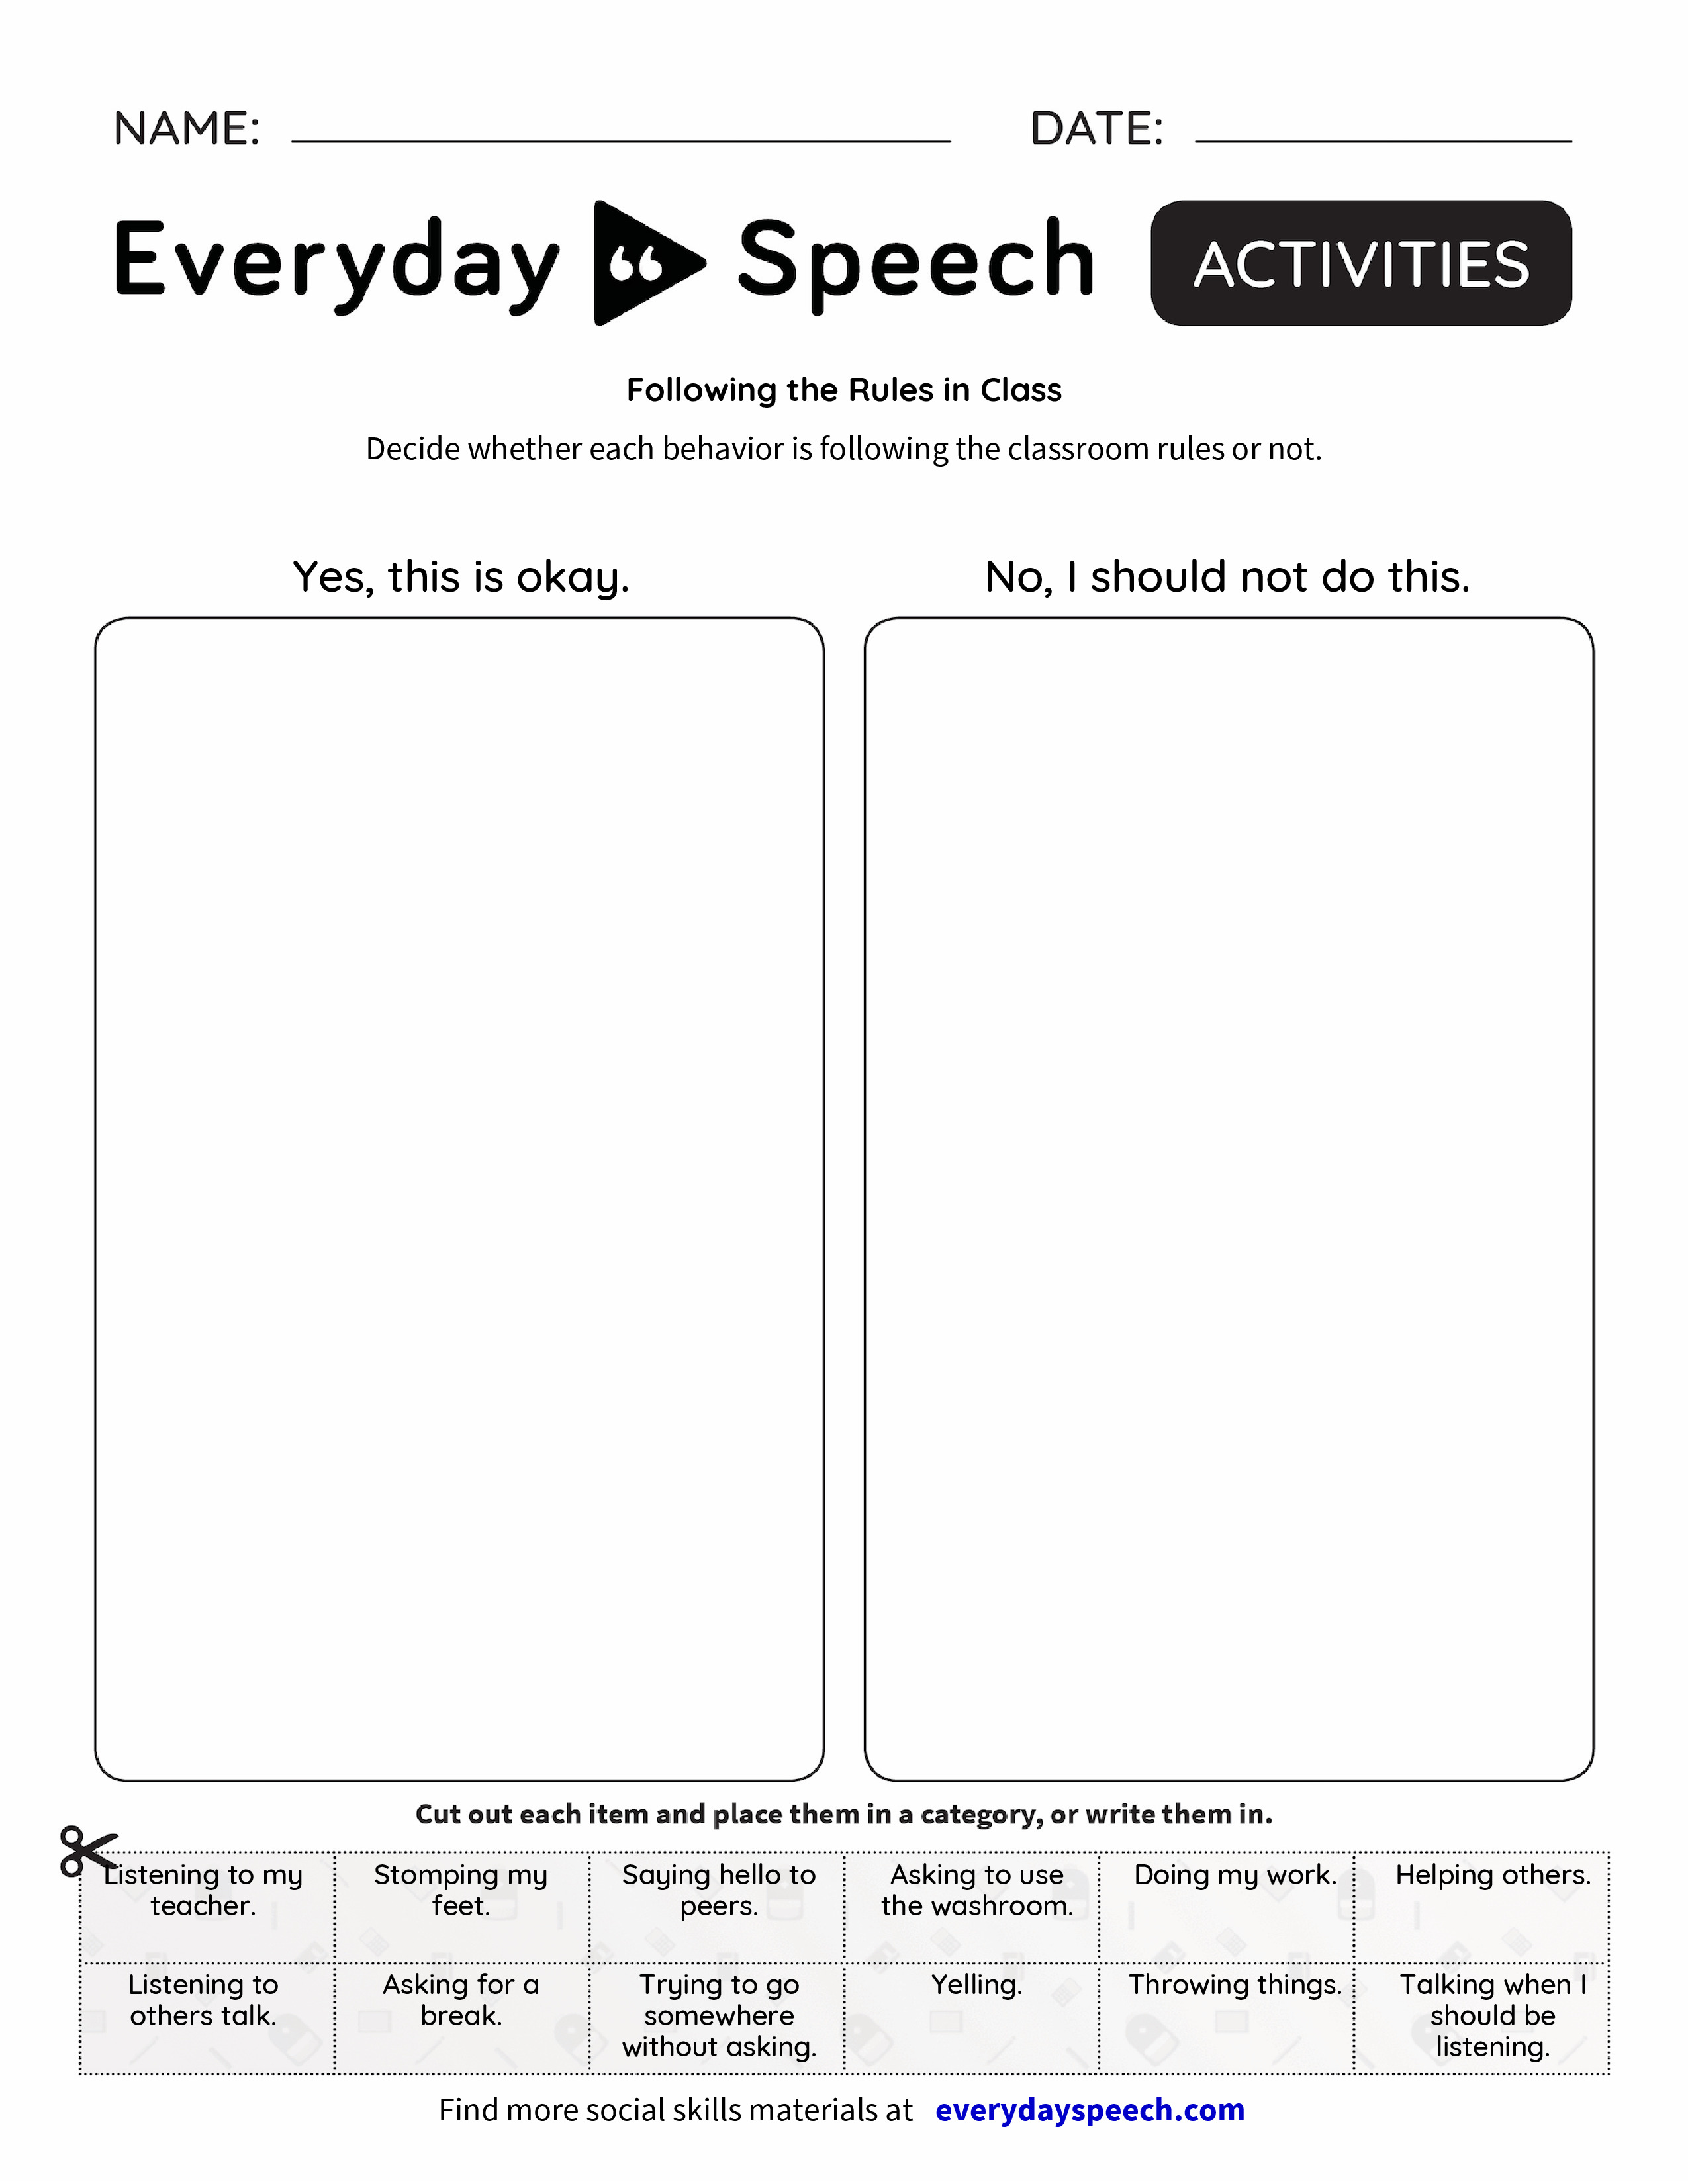 Following the Rules in Class - Everyday Speech - Everyday Speech